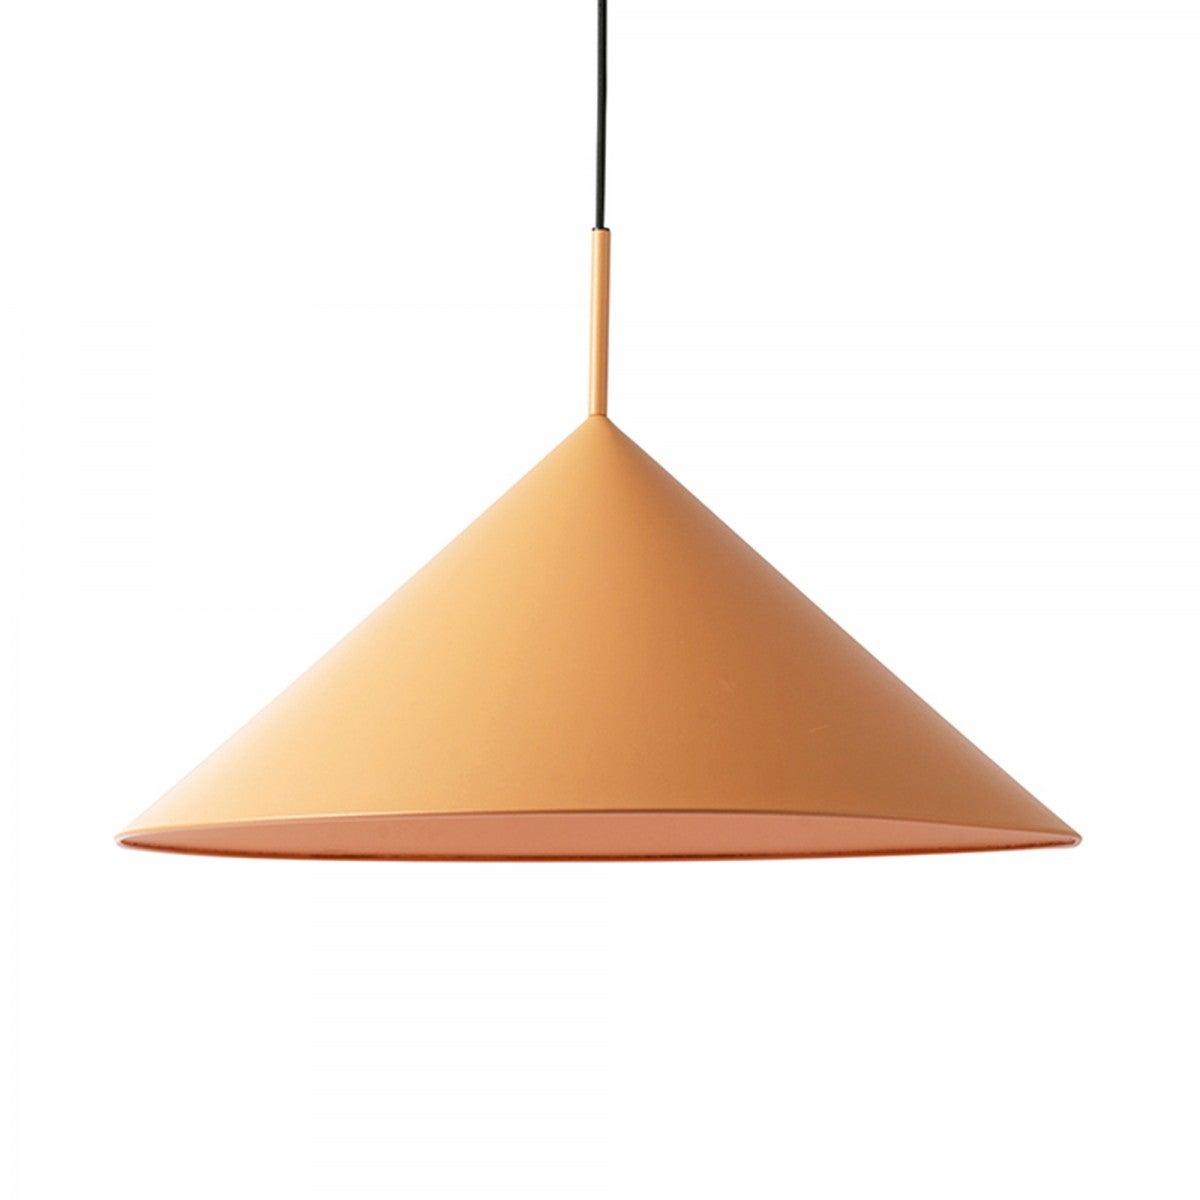 triangle-pendant-lamp-peach-metal